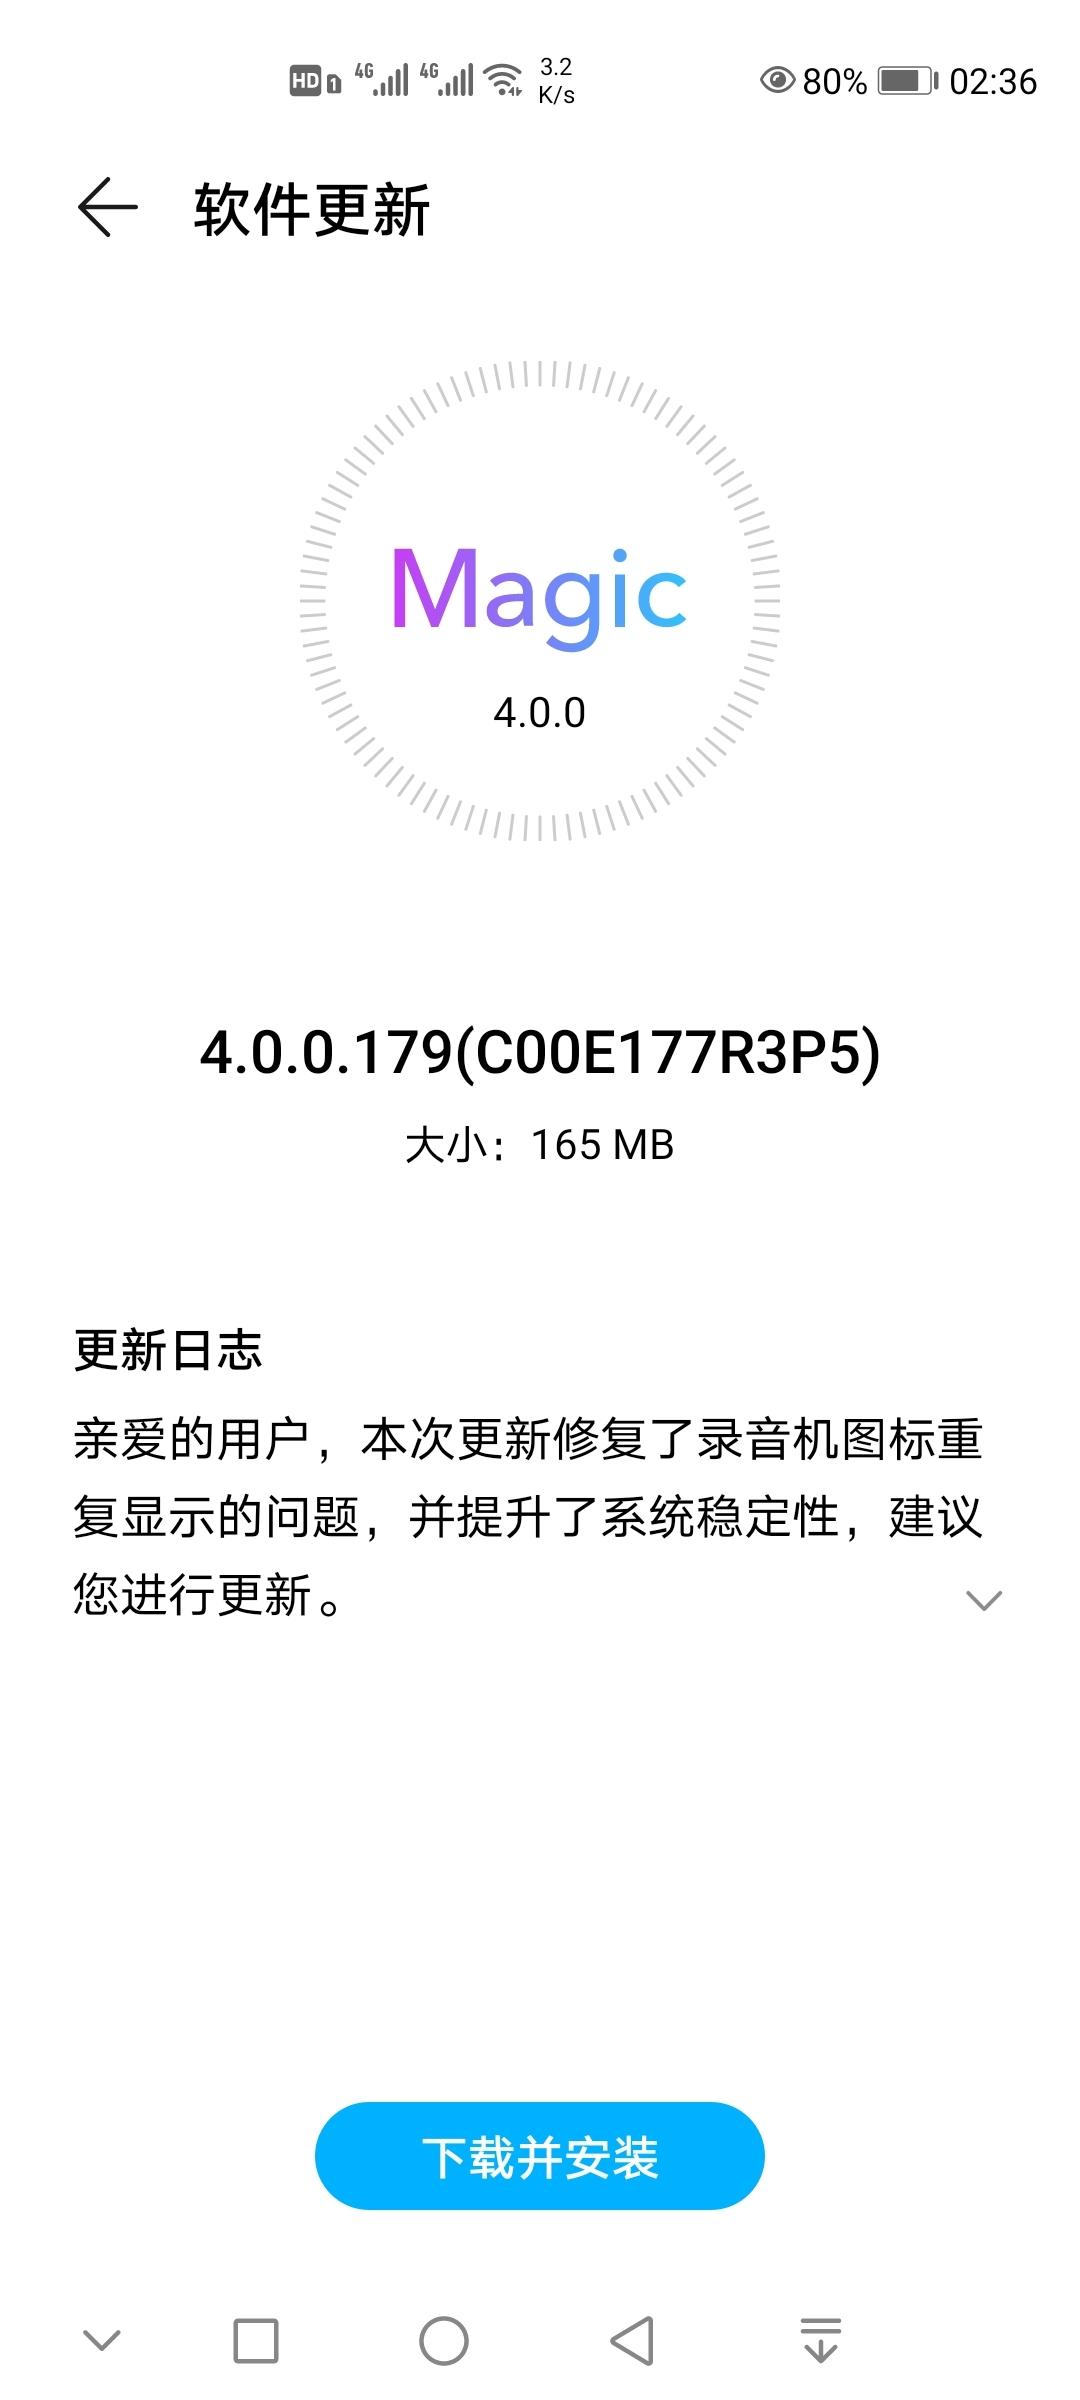 Screenshot_20210516_023640_com.huawei.android.hwouc.jpg